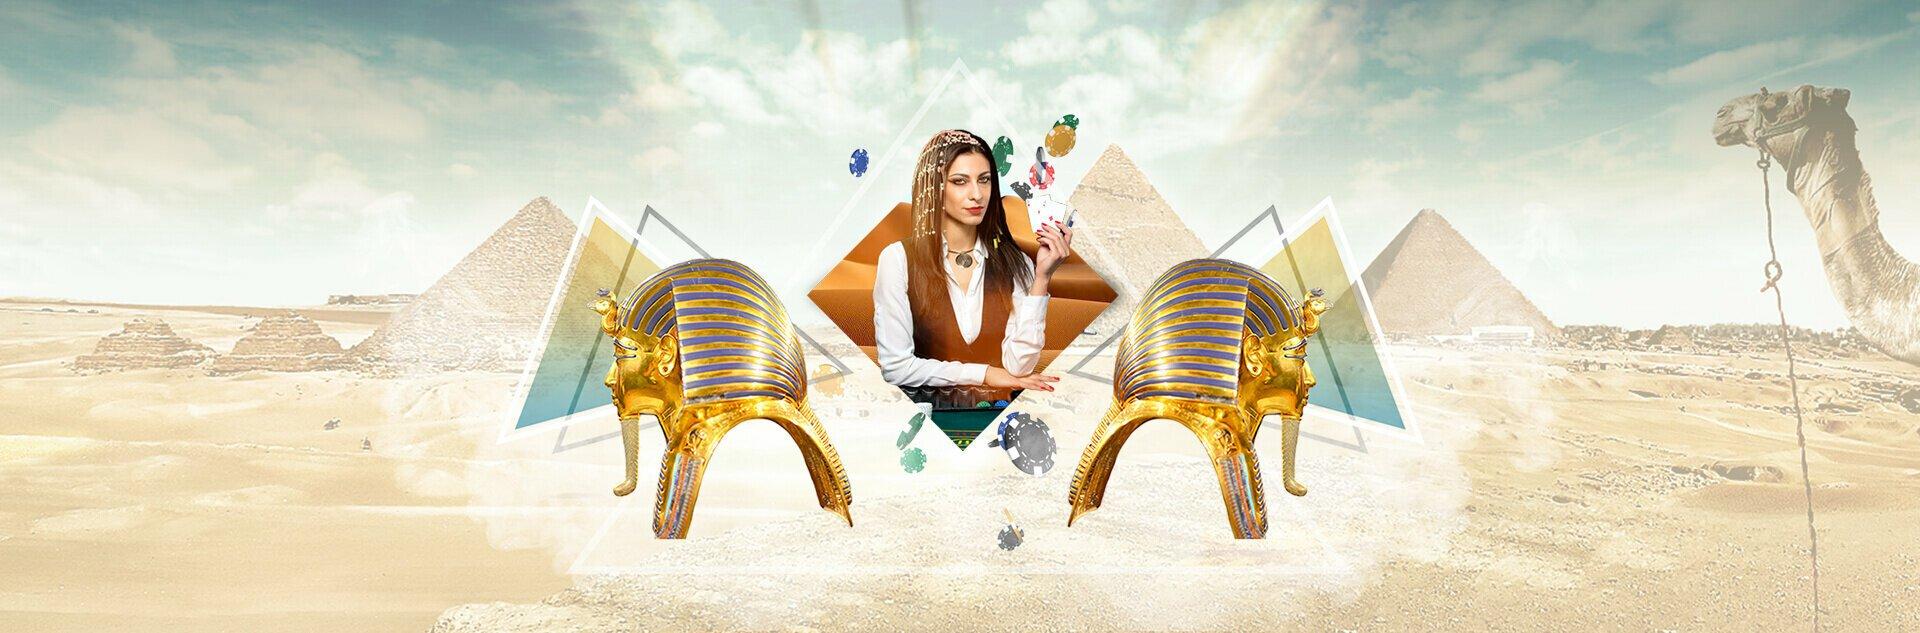 Temple Nile casino review UK